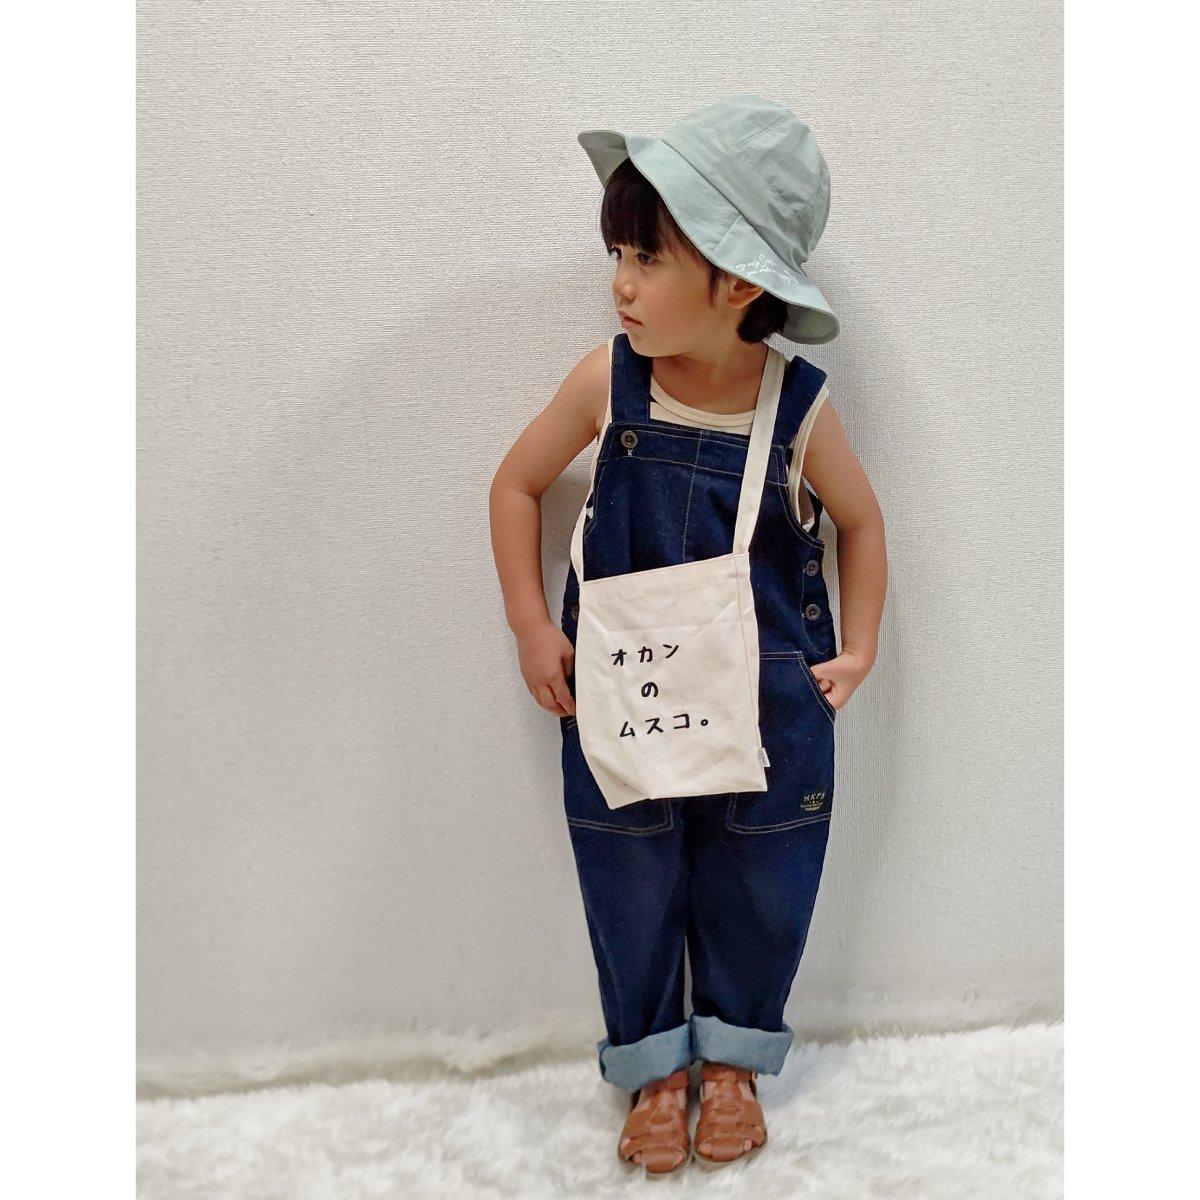 Cotton HF Sacoche(親子シリーズ) 詳細画像14